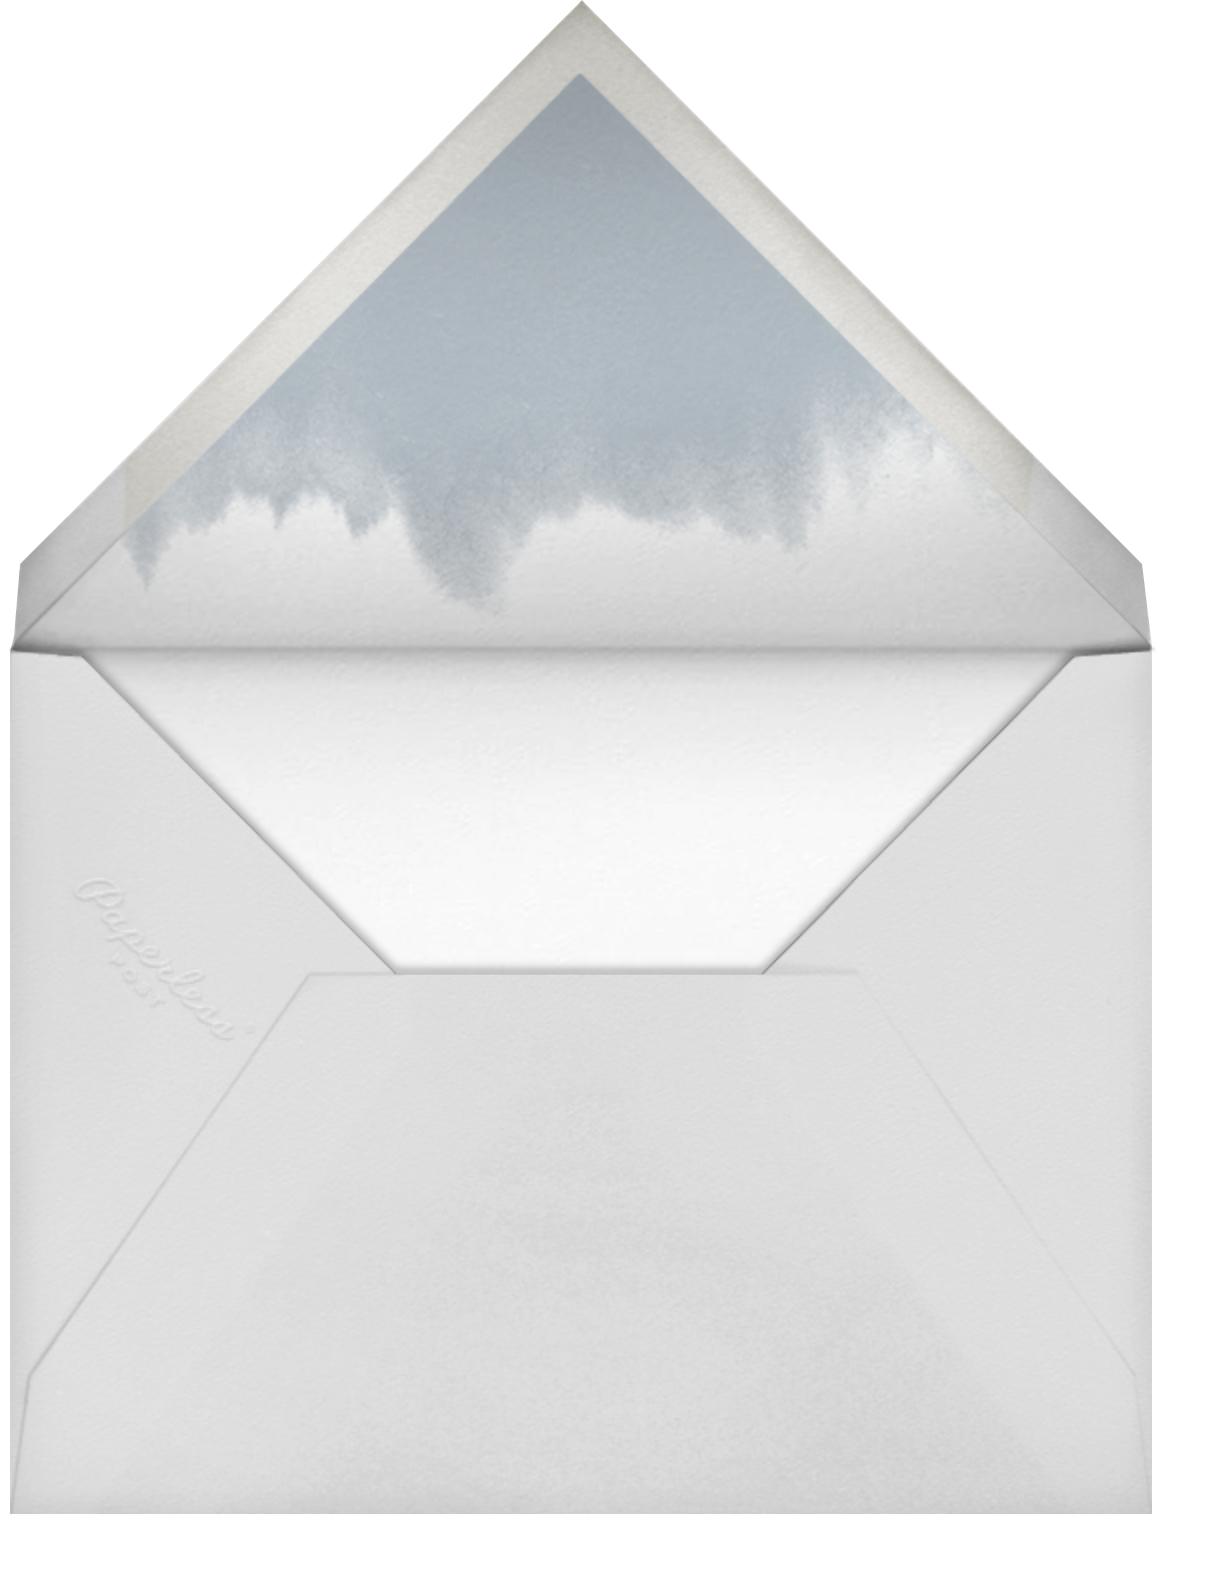 Sapphire - Paper Source - Retirement party - envelope back